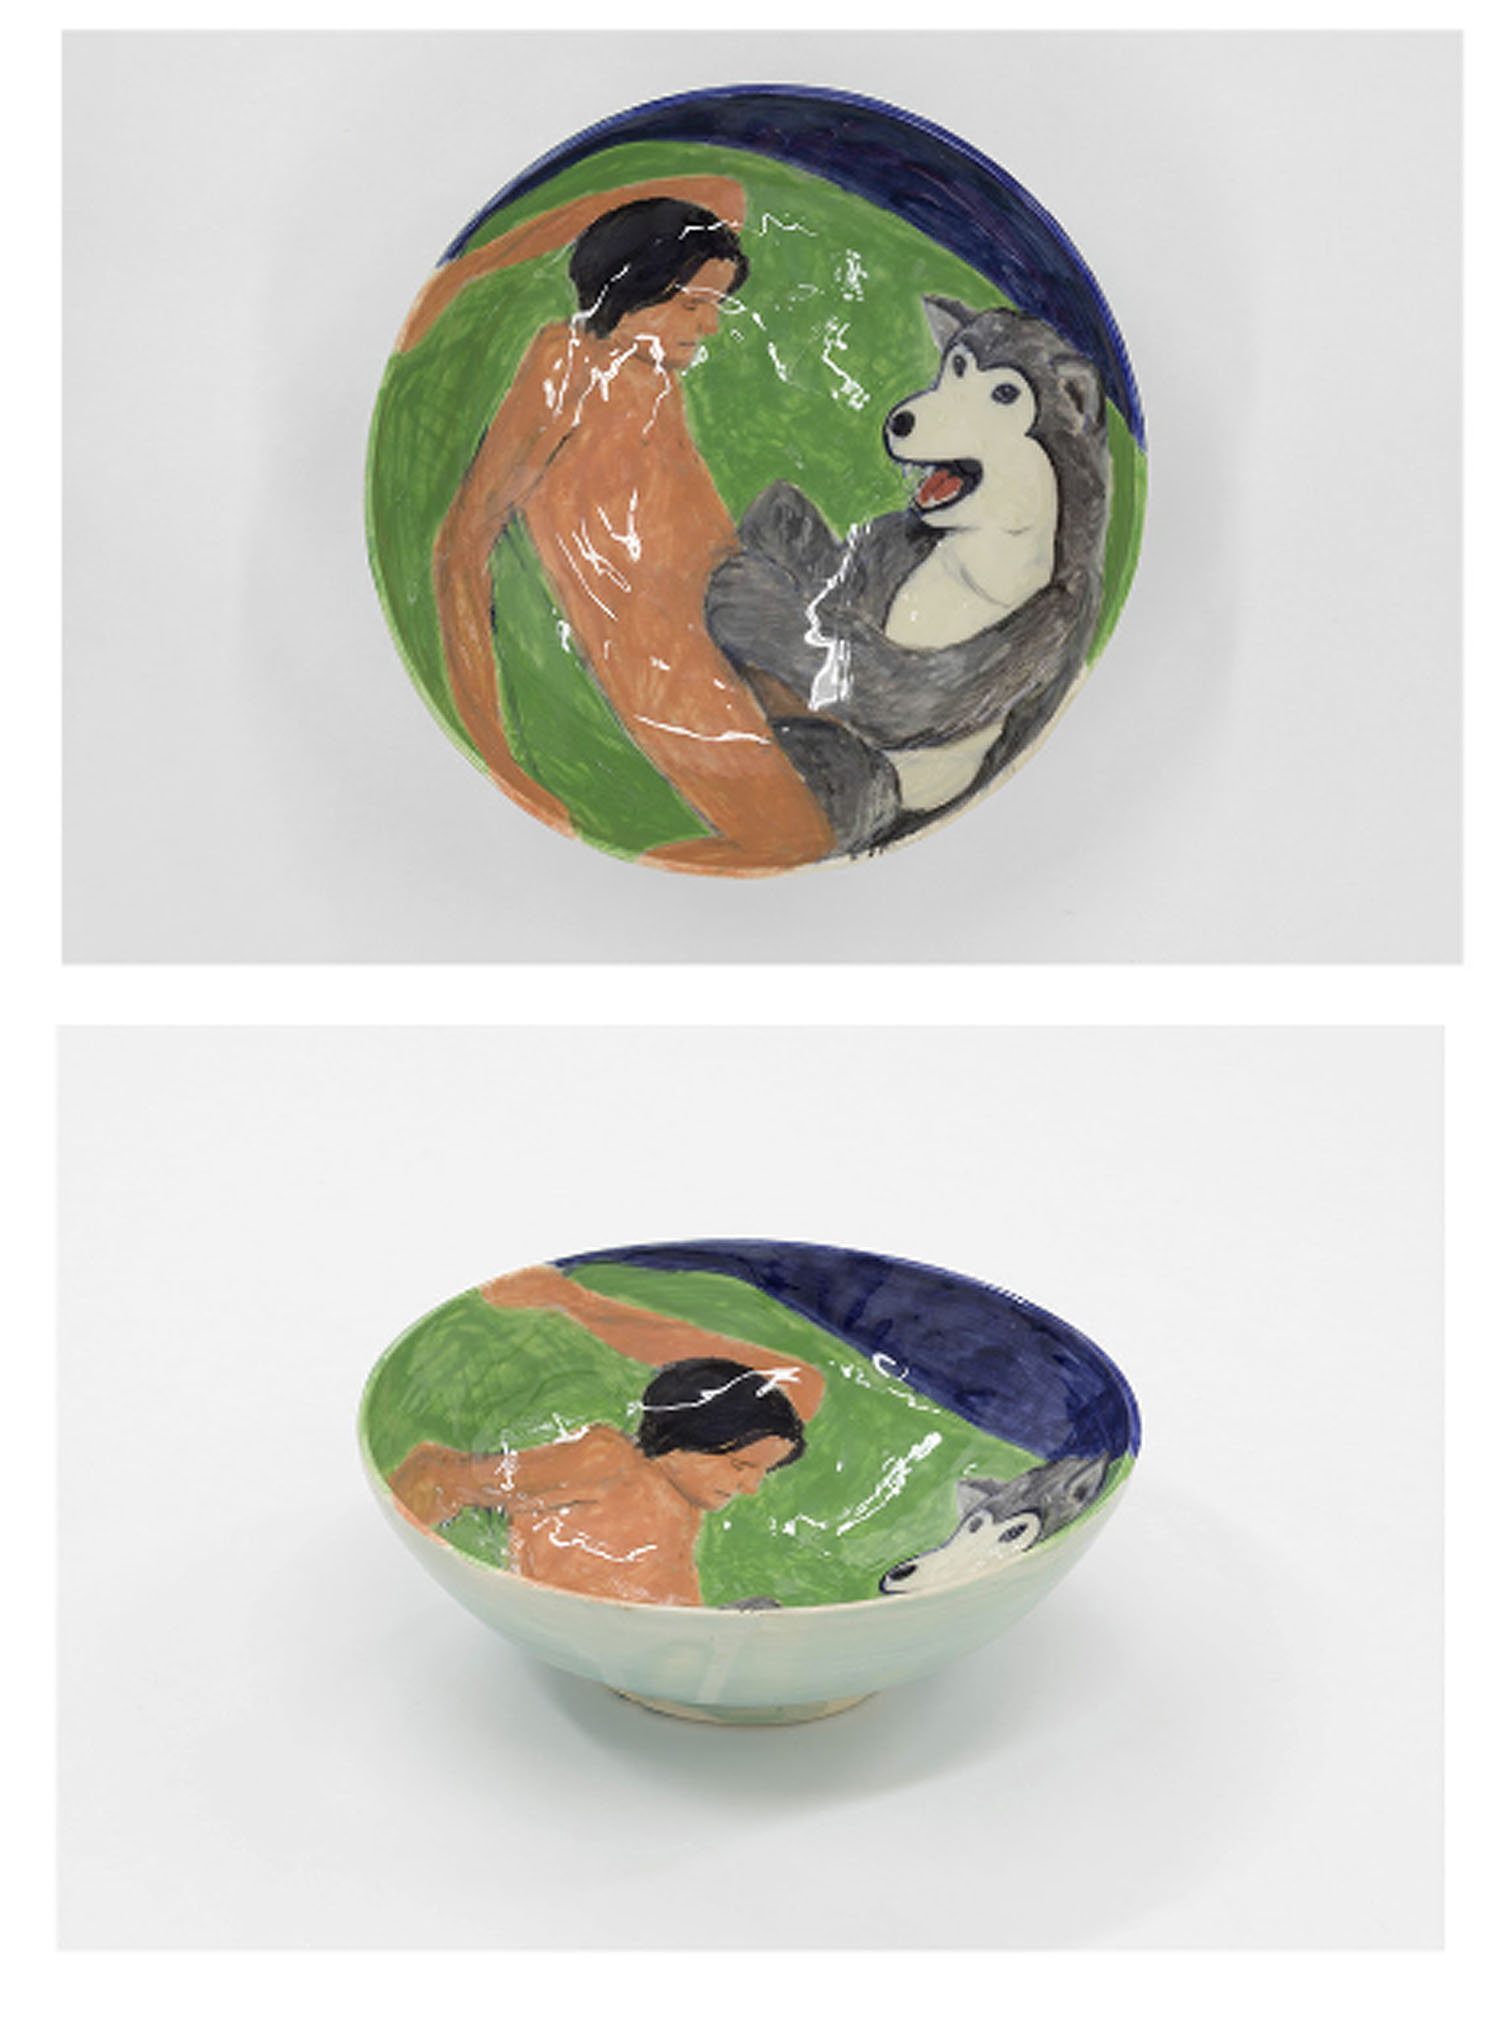 Urara Tsuchiya   Furries , 2016  Glazed stoneware bowl  Dimensions variable